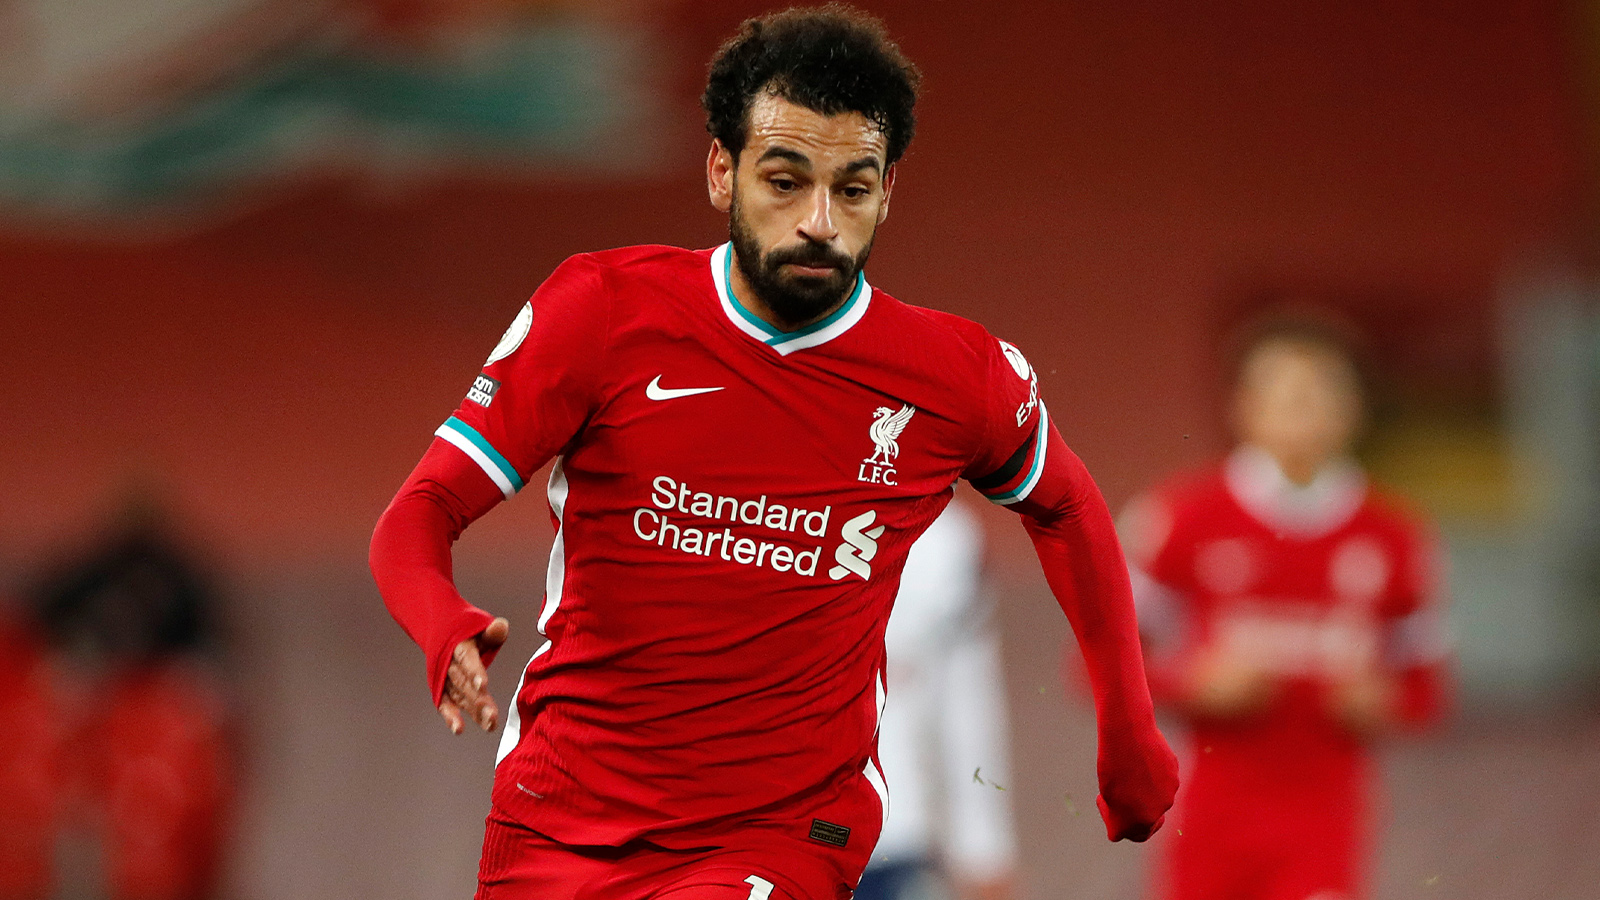 Real Madrid plot summer move for Liverpool's Mohamed Salah - Report